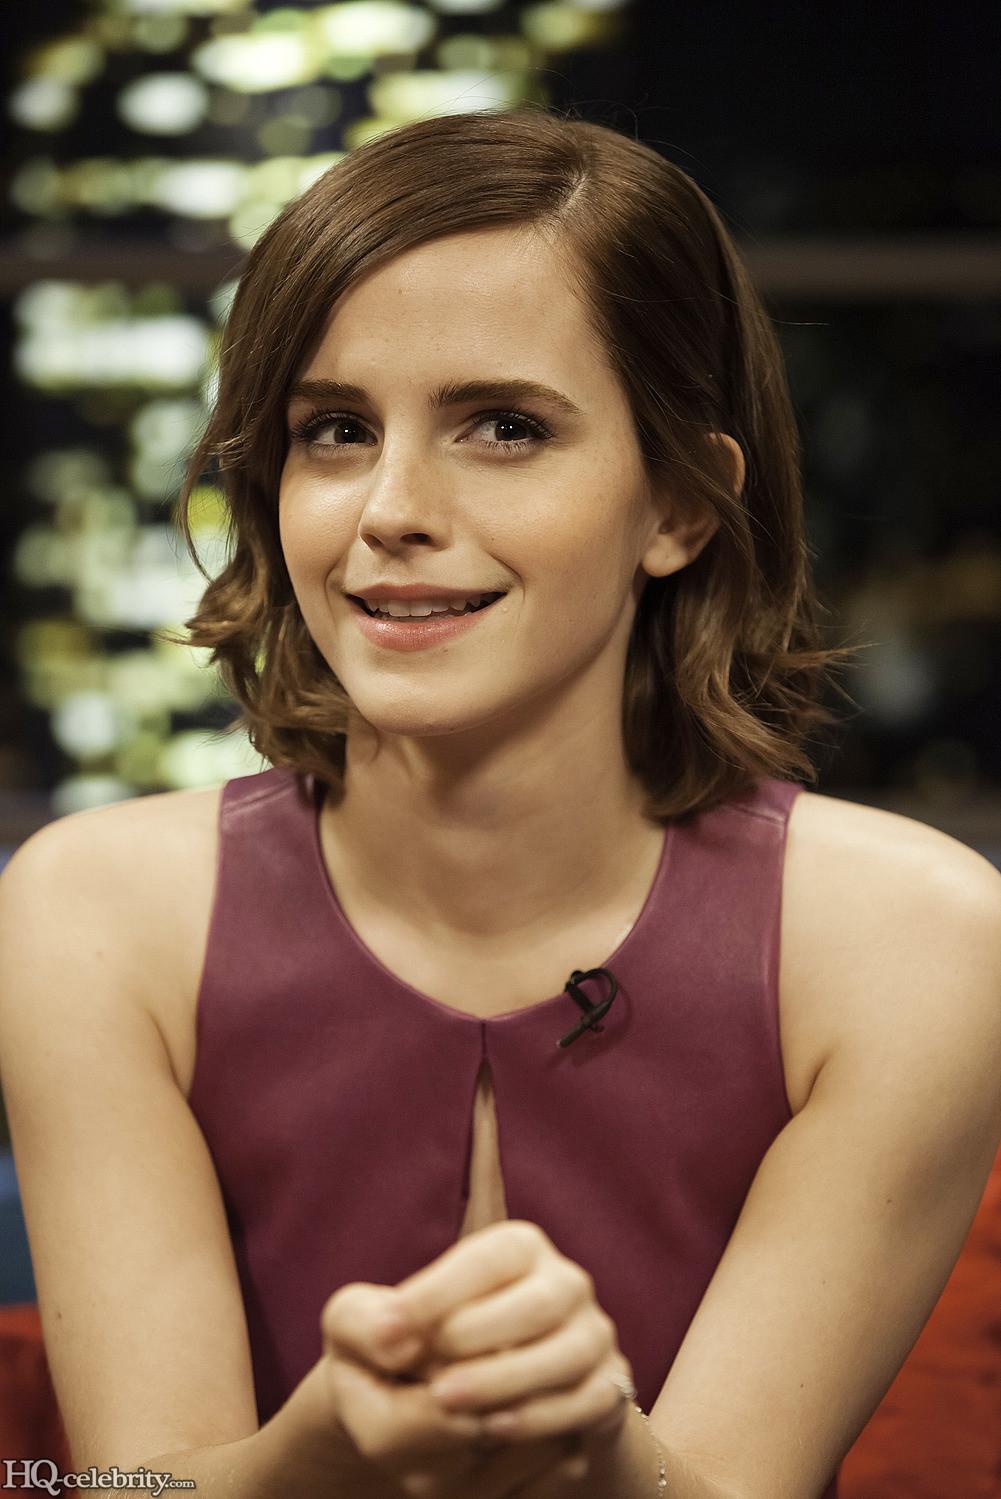 Emma Watson Has A Blast On The Jonathan Ross Show AcyJqJl5